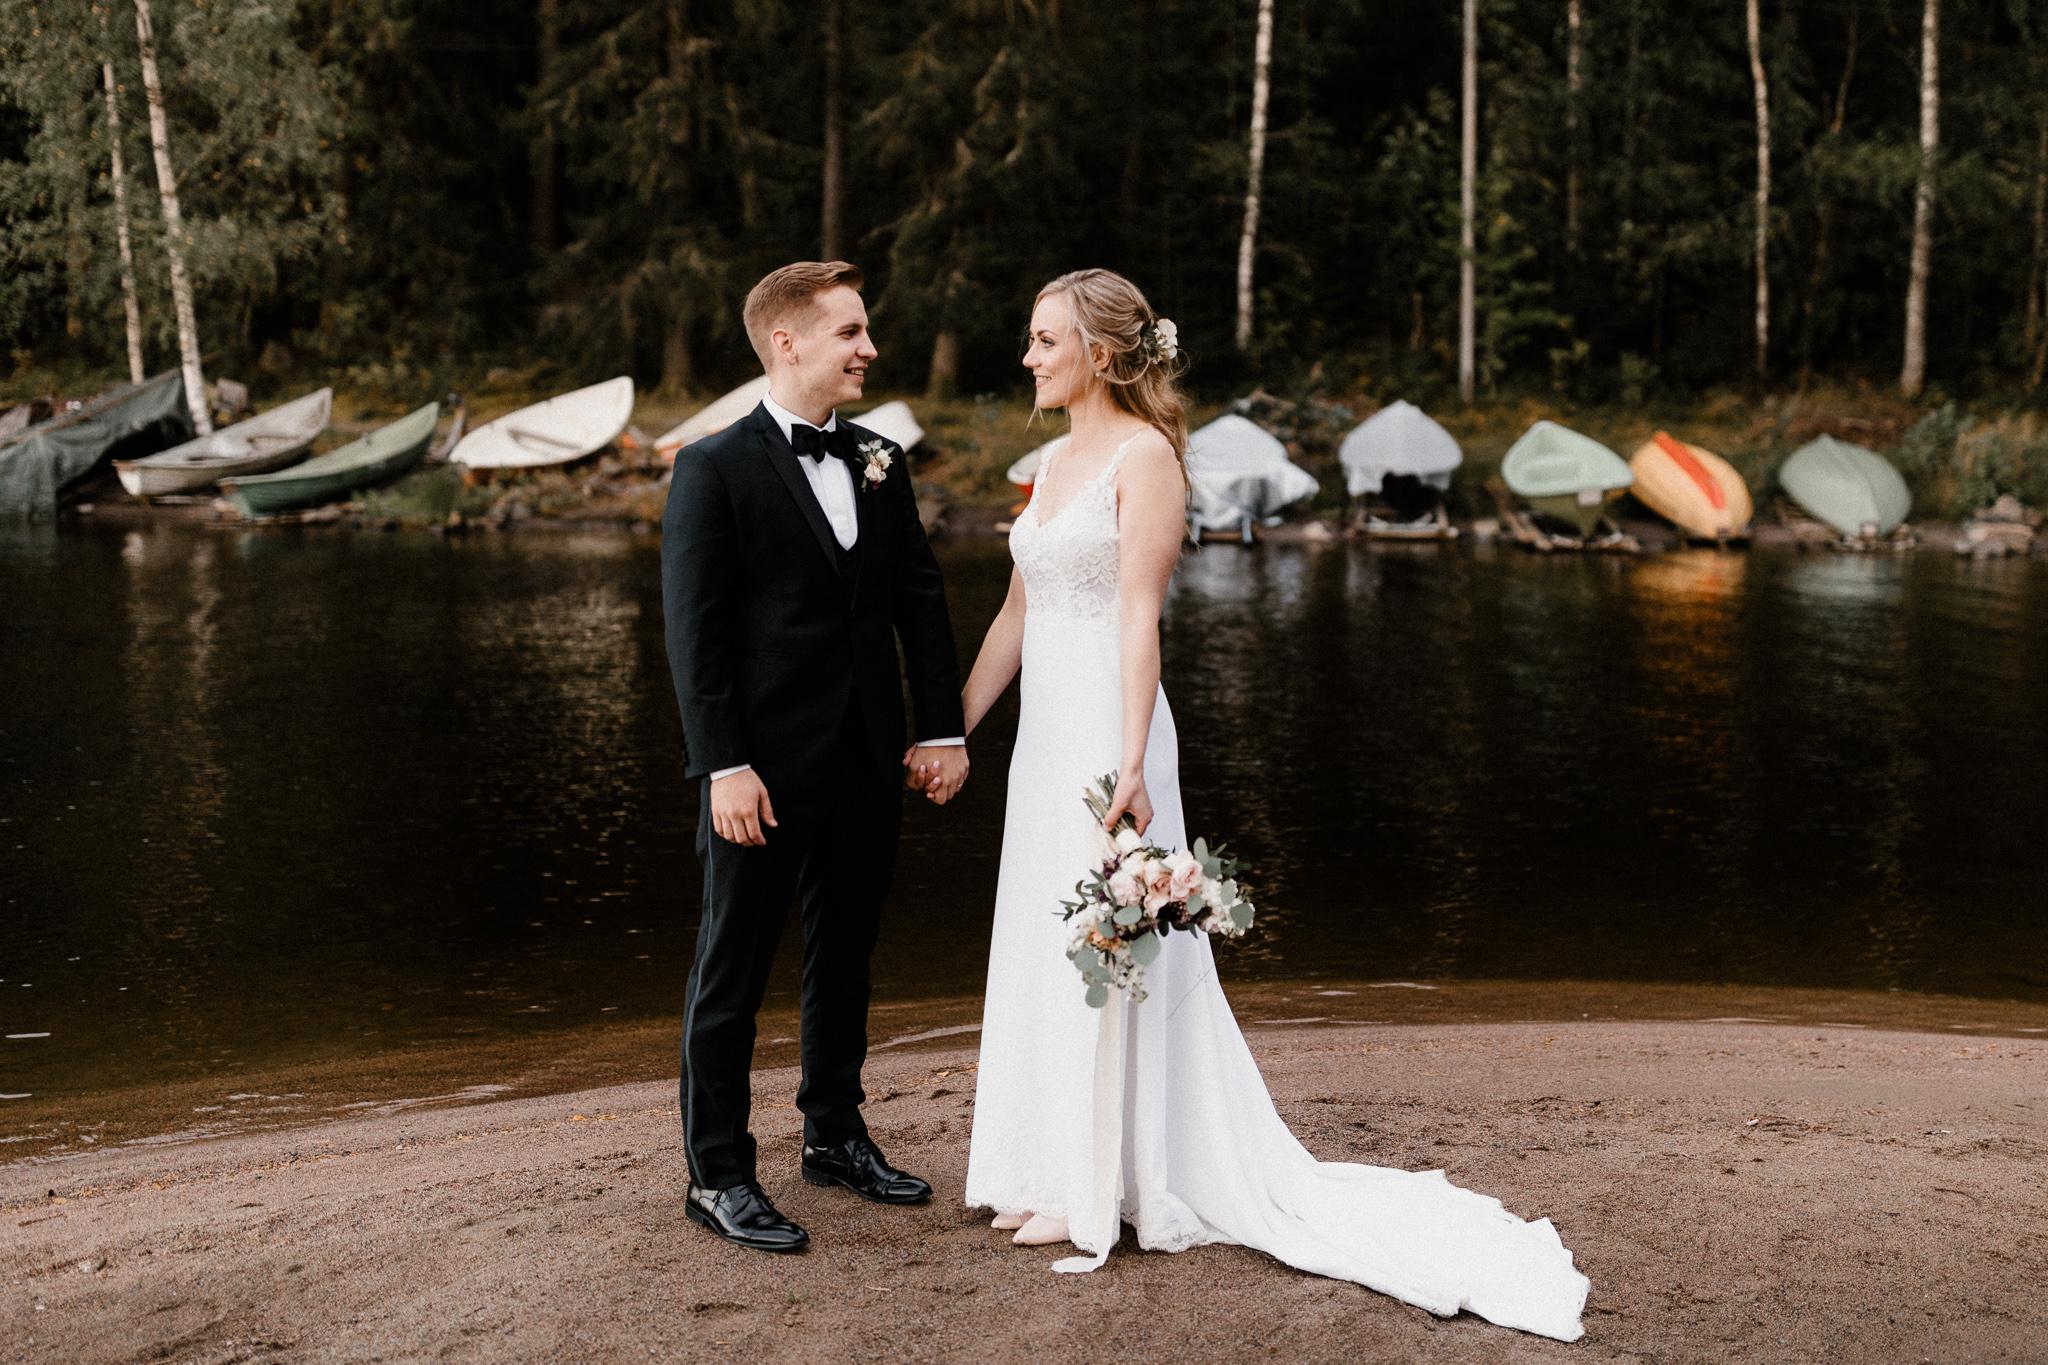 Johanna + Mikko - Tampere - Photo by Patrick Karkkolainen Wedding Photographer-169.jpg